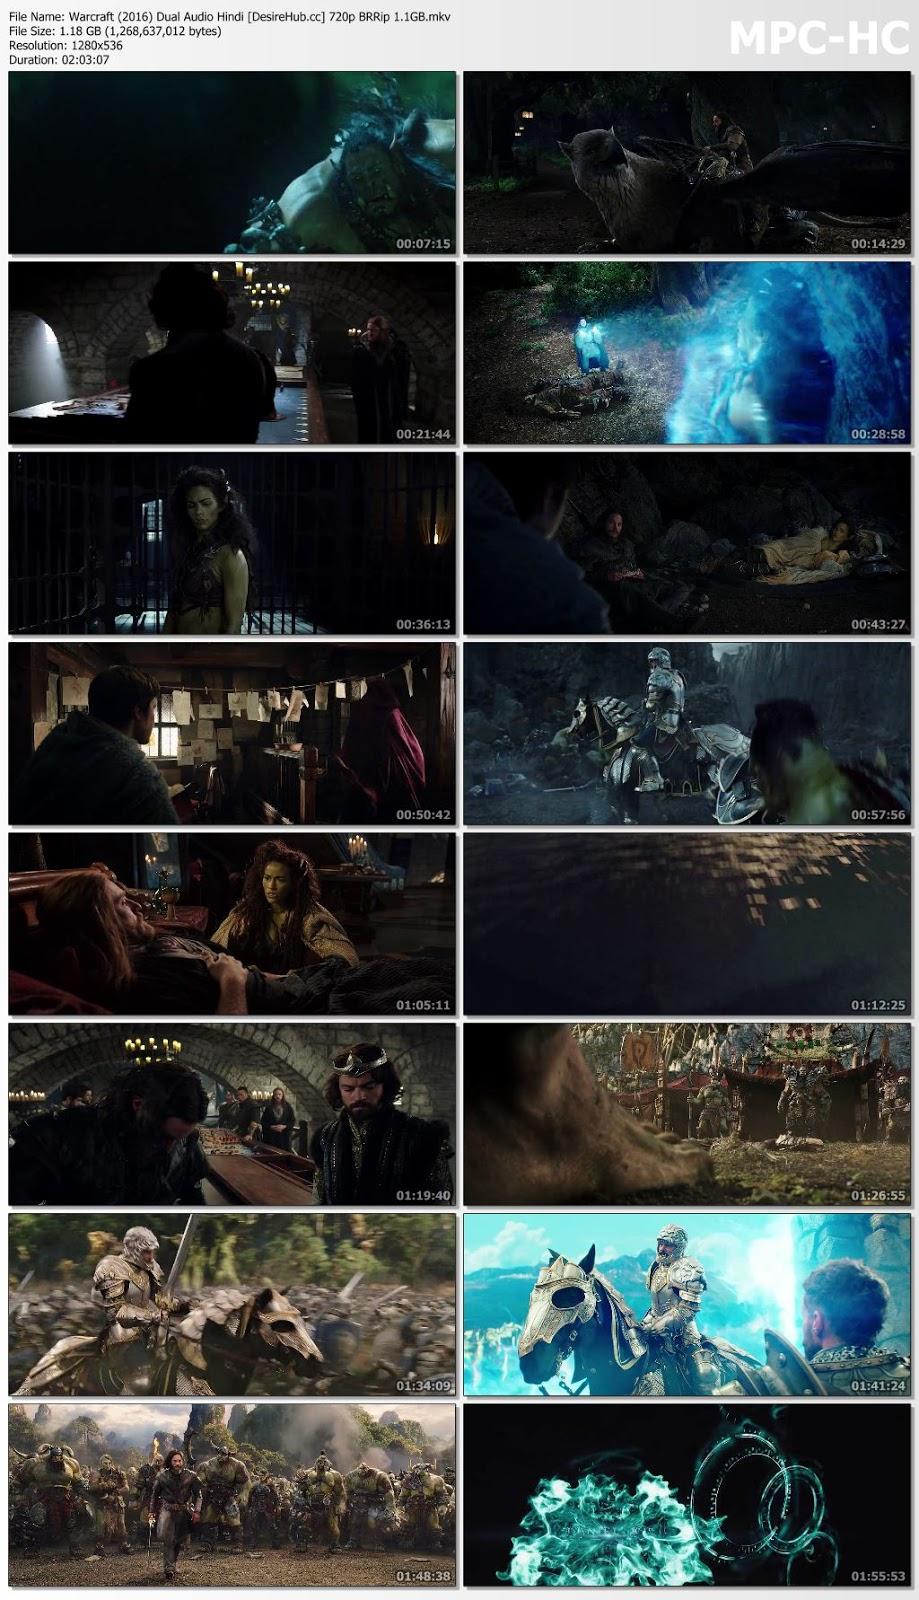 Warcraft (2016) Dual Audio Hindi 720p BRRip 1.1GB Desirehub